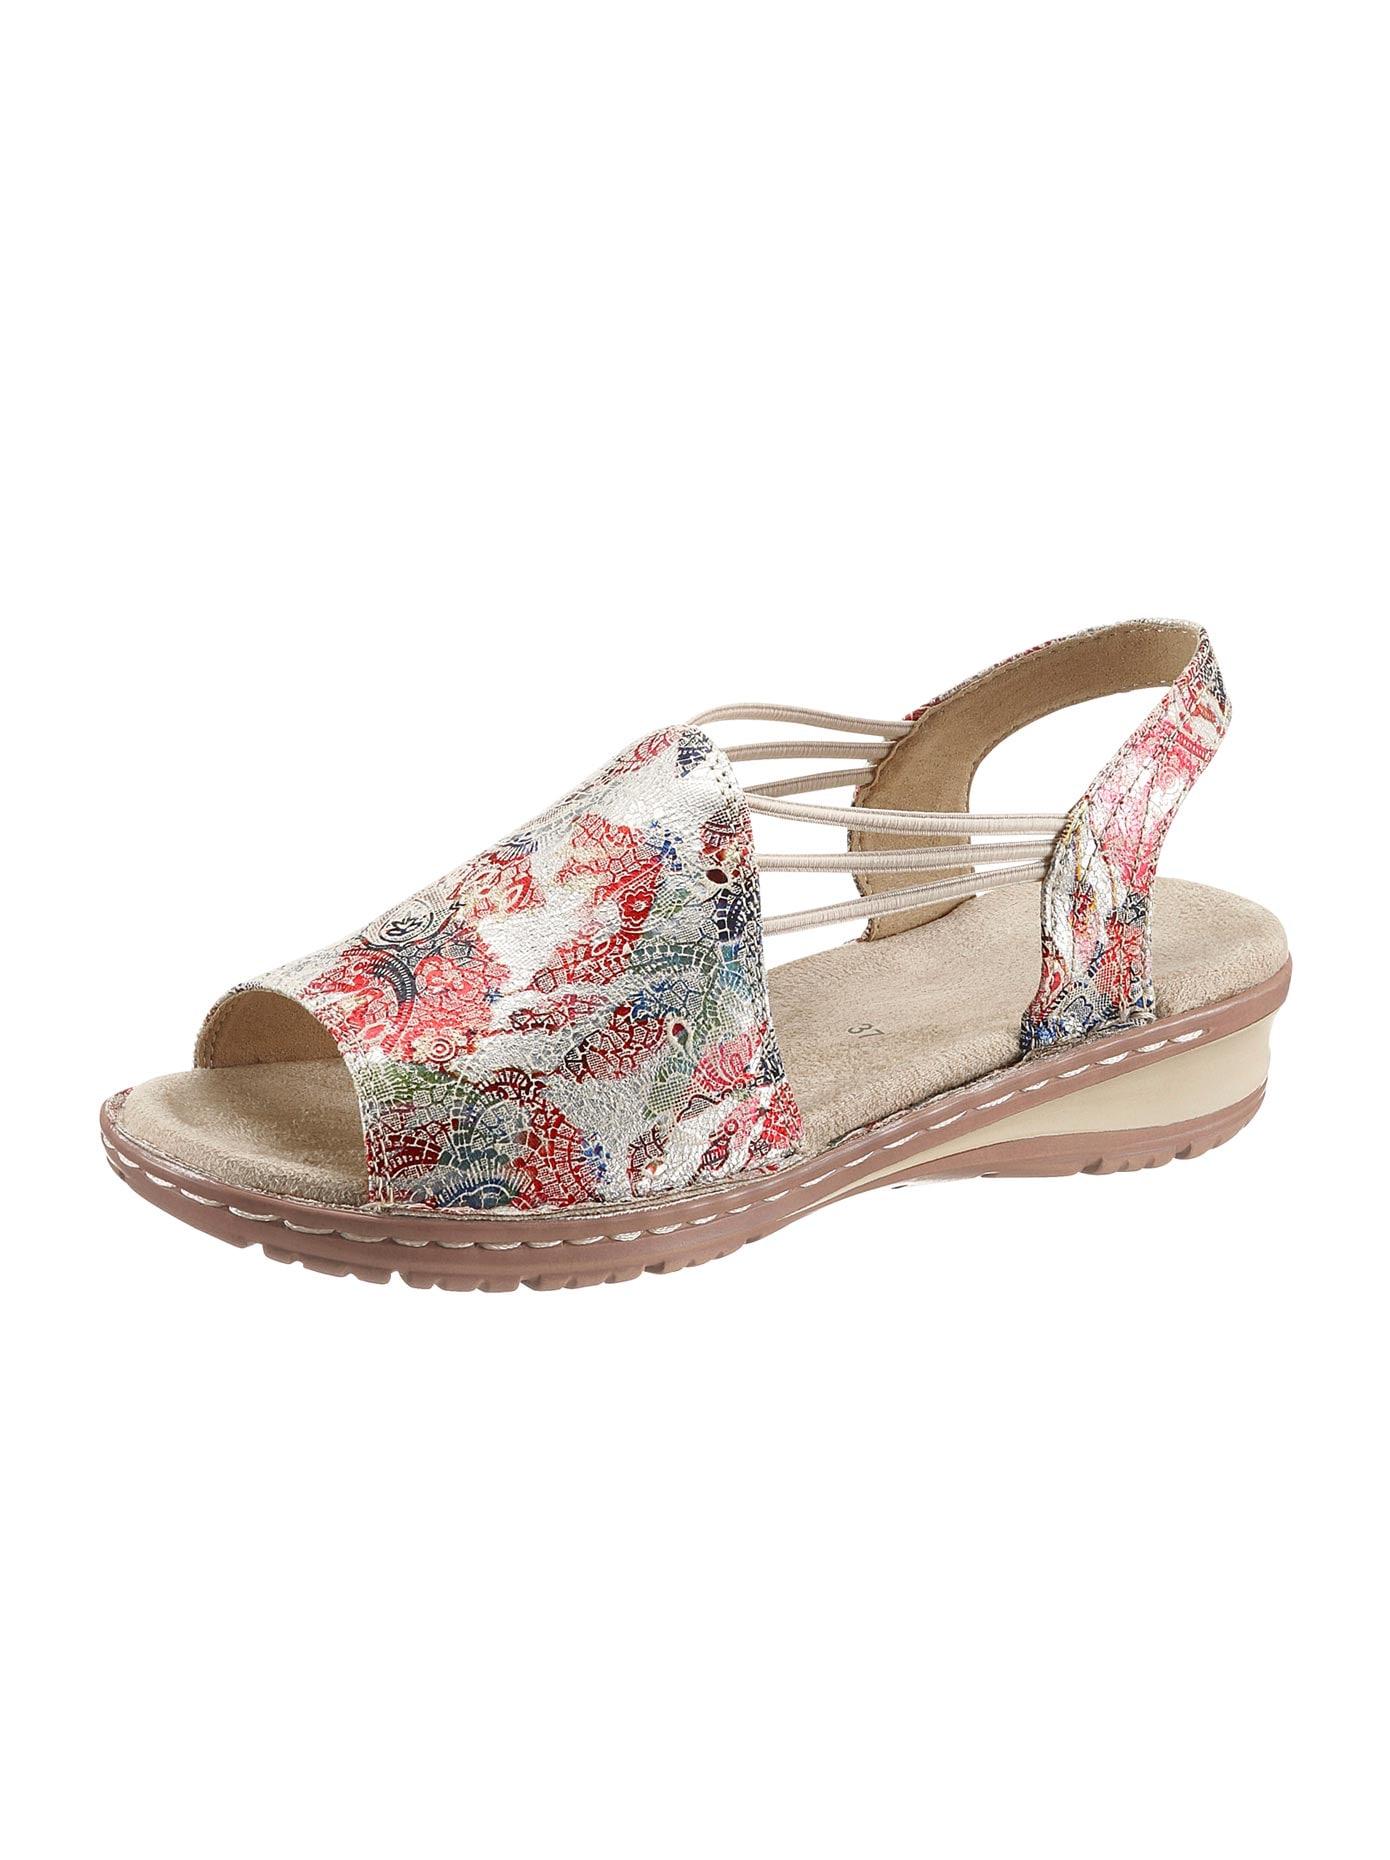 Ara Sandalette braun Damen Sandaletten Sandalen